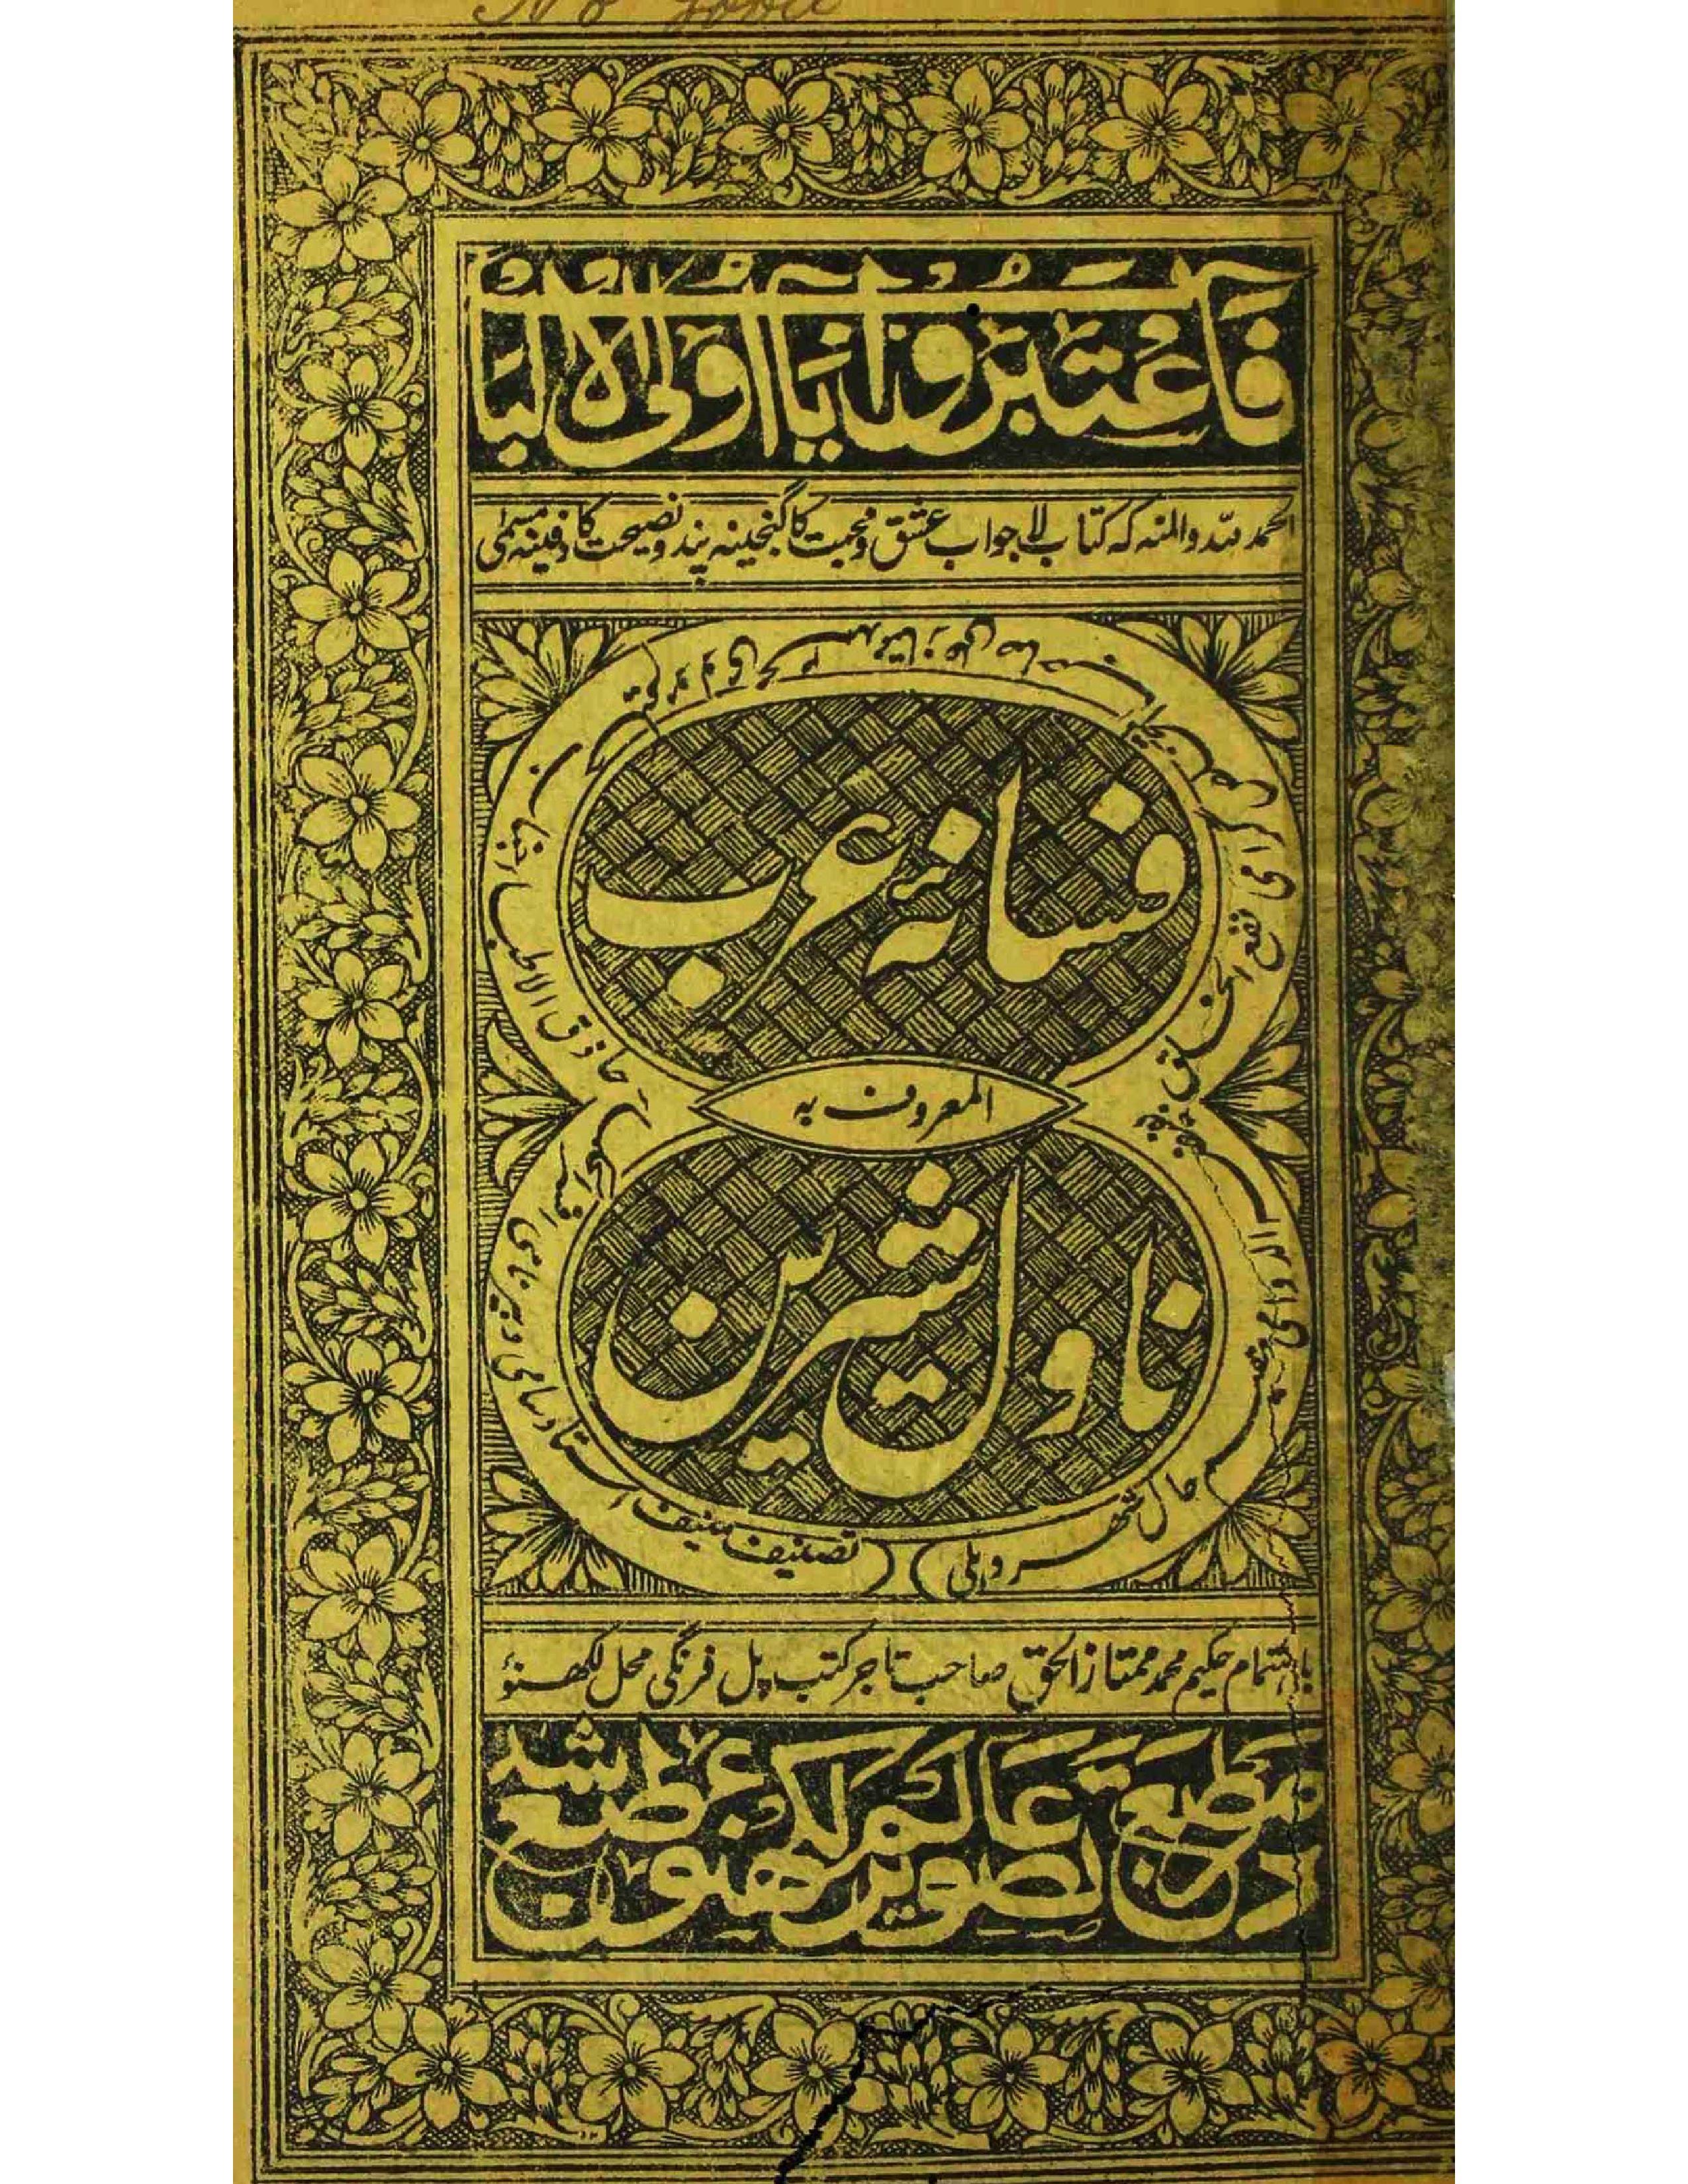 Fasana-e-Arab